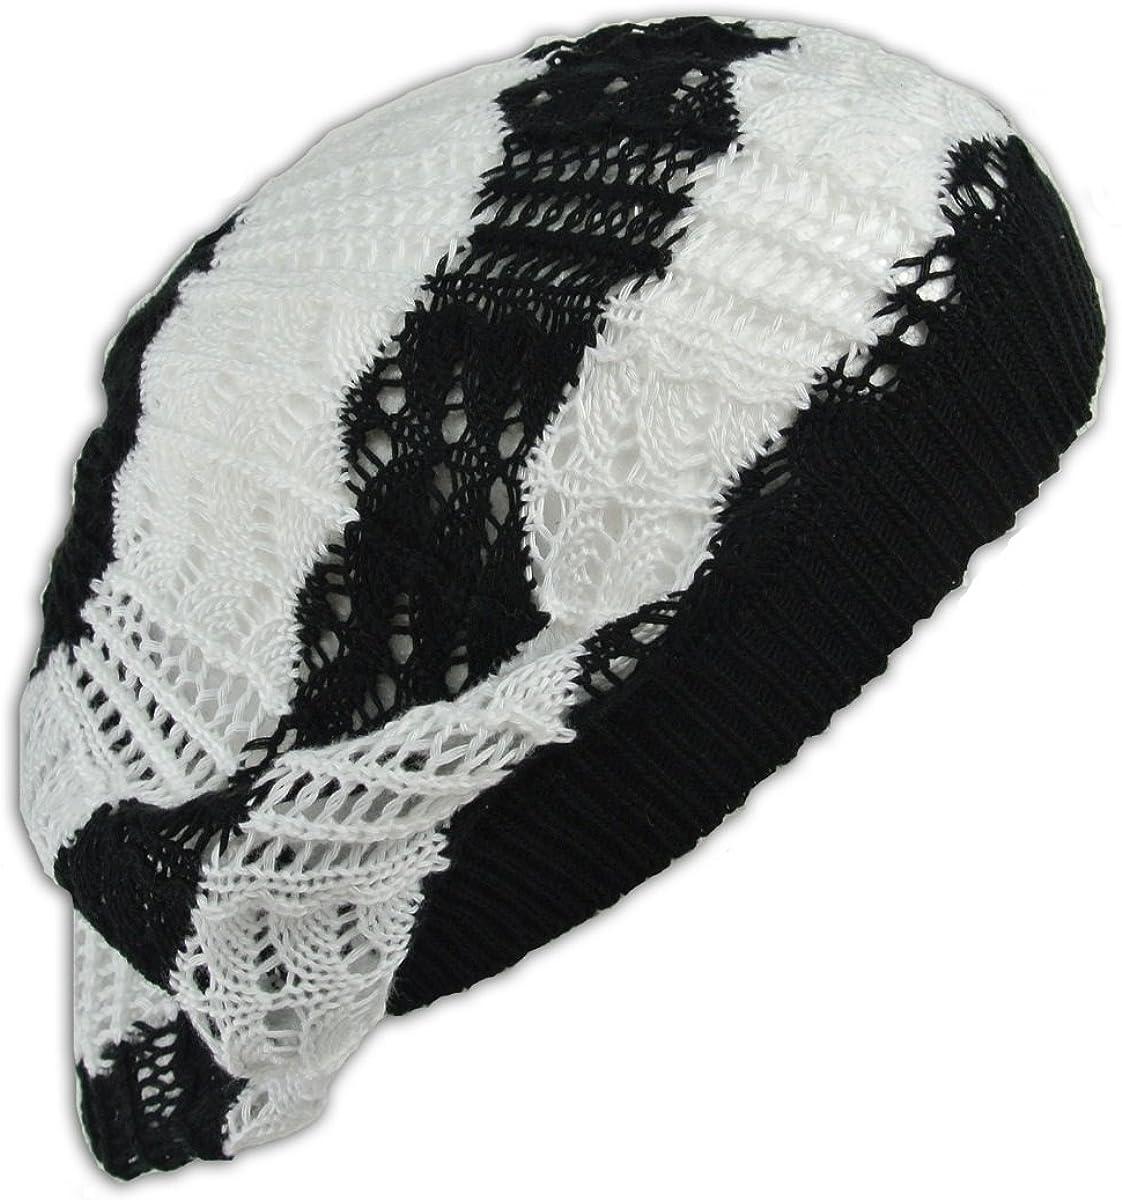 Jh Sports Crochet Beanie Hat Knit Beret Skull Cap Tam